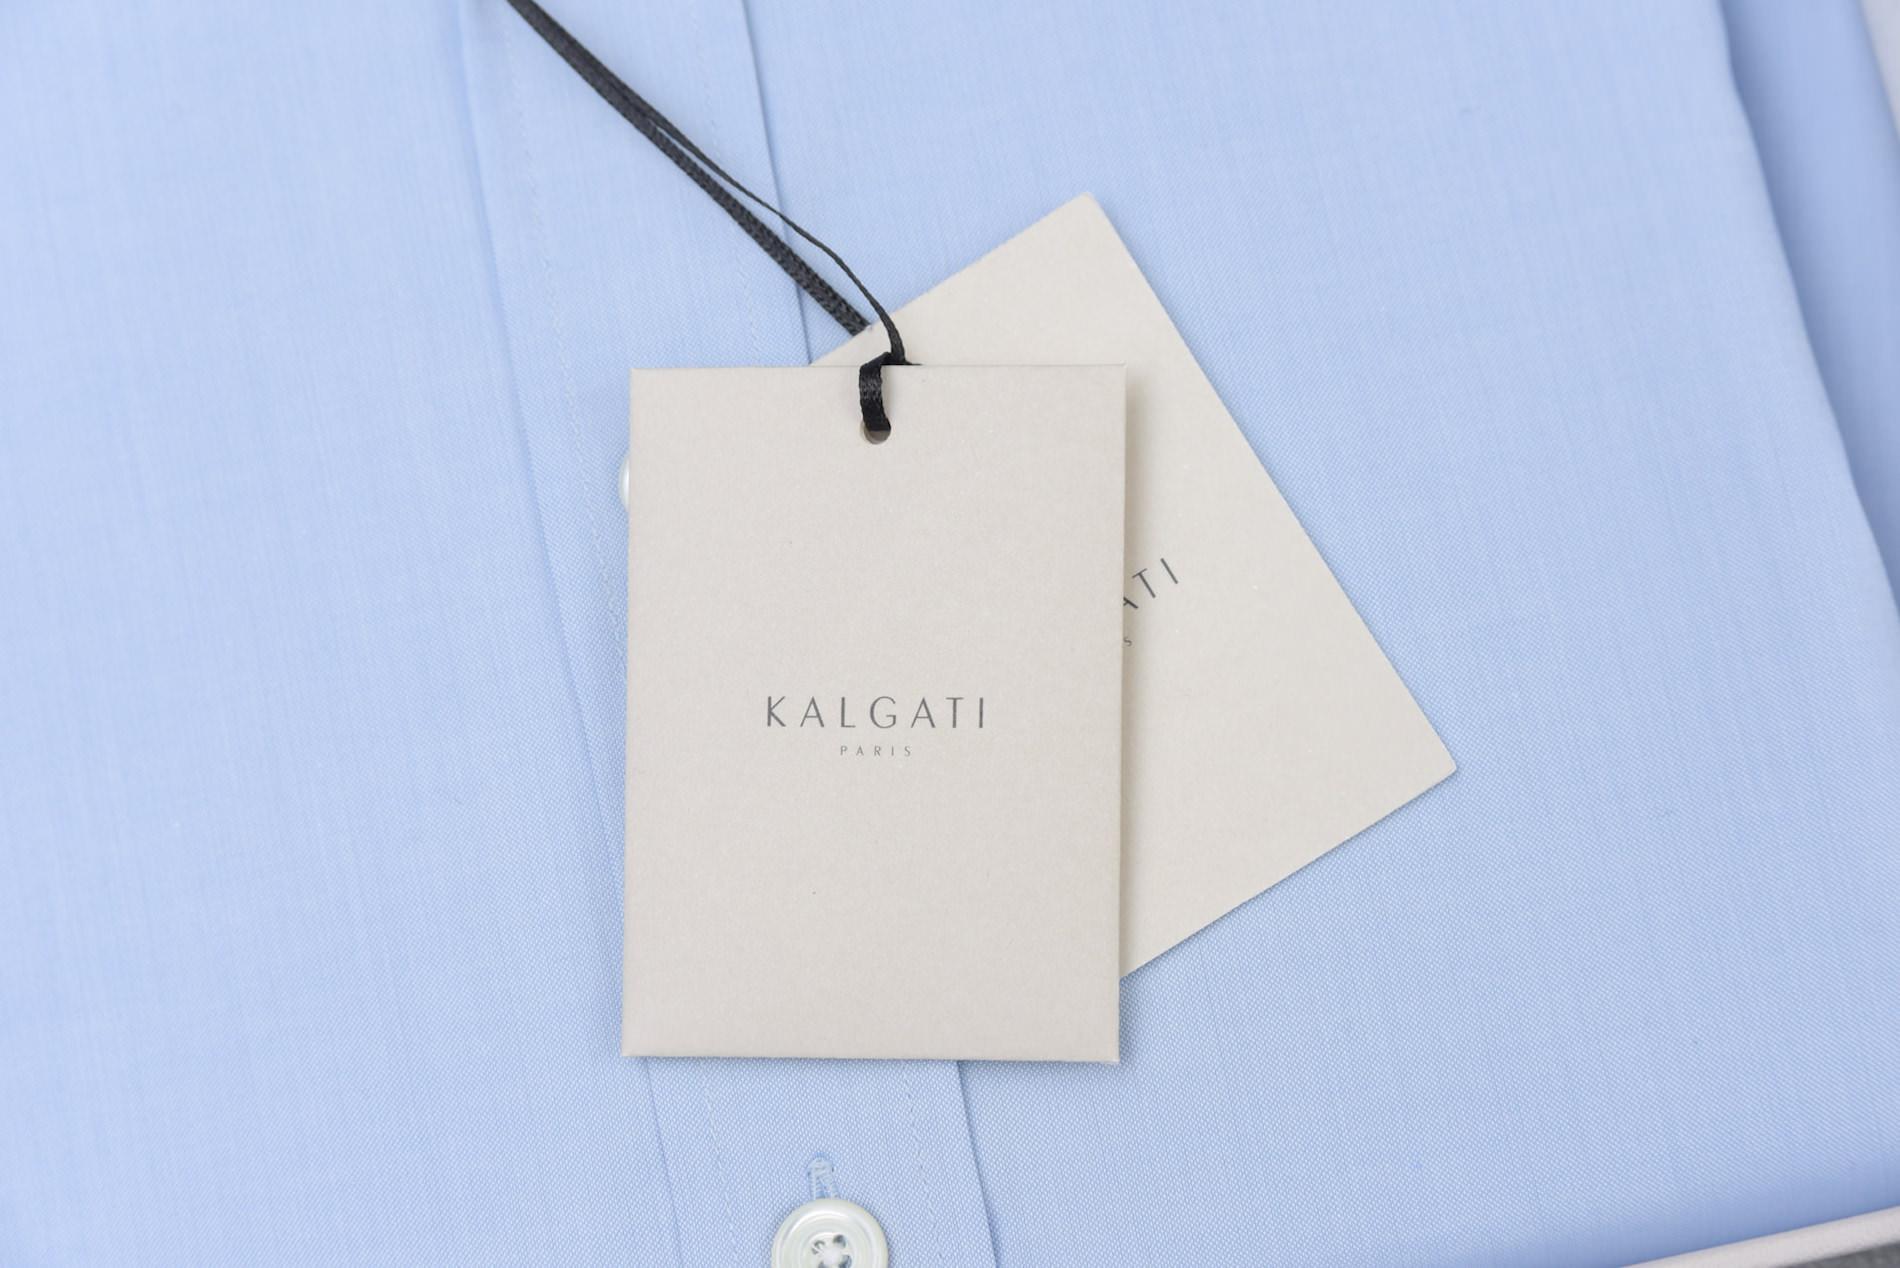 kalgati-x-verygoodlord-7-sur-27